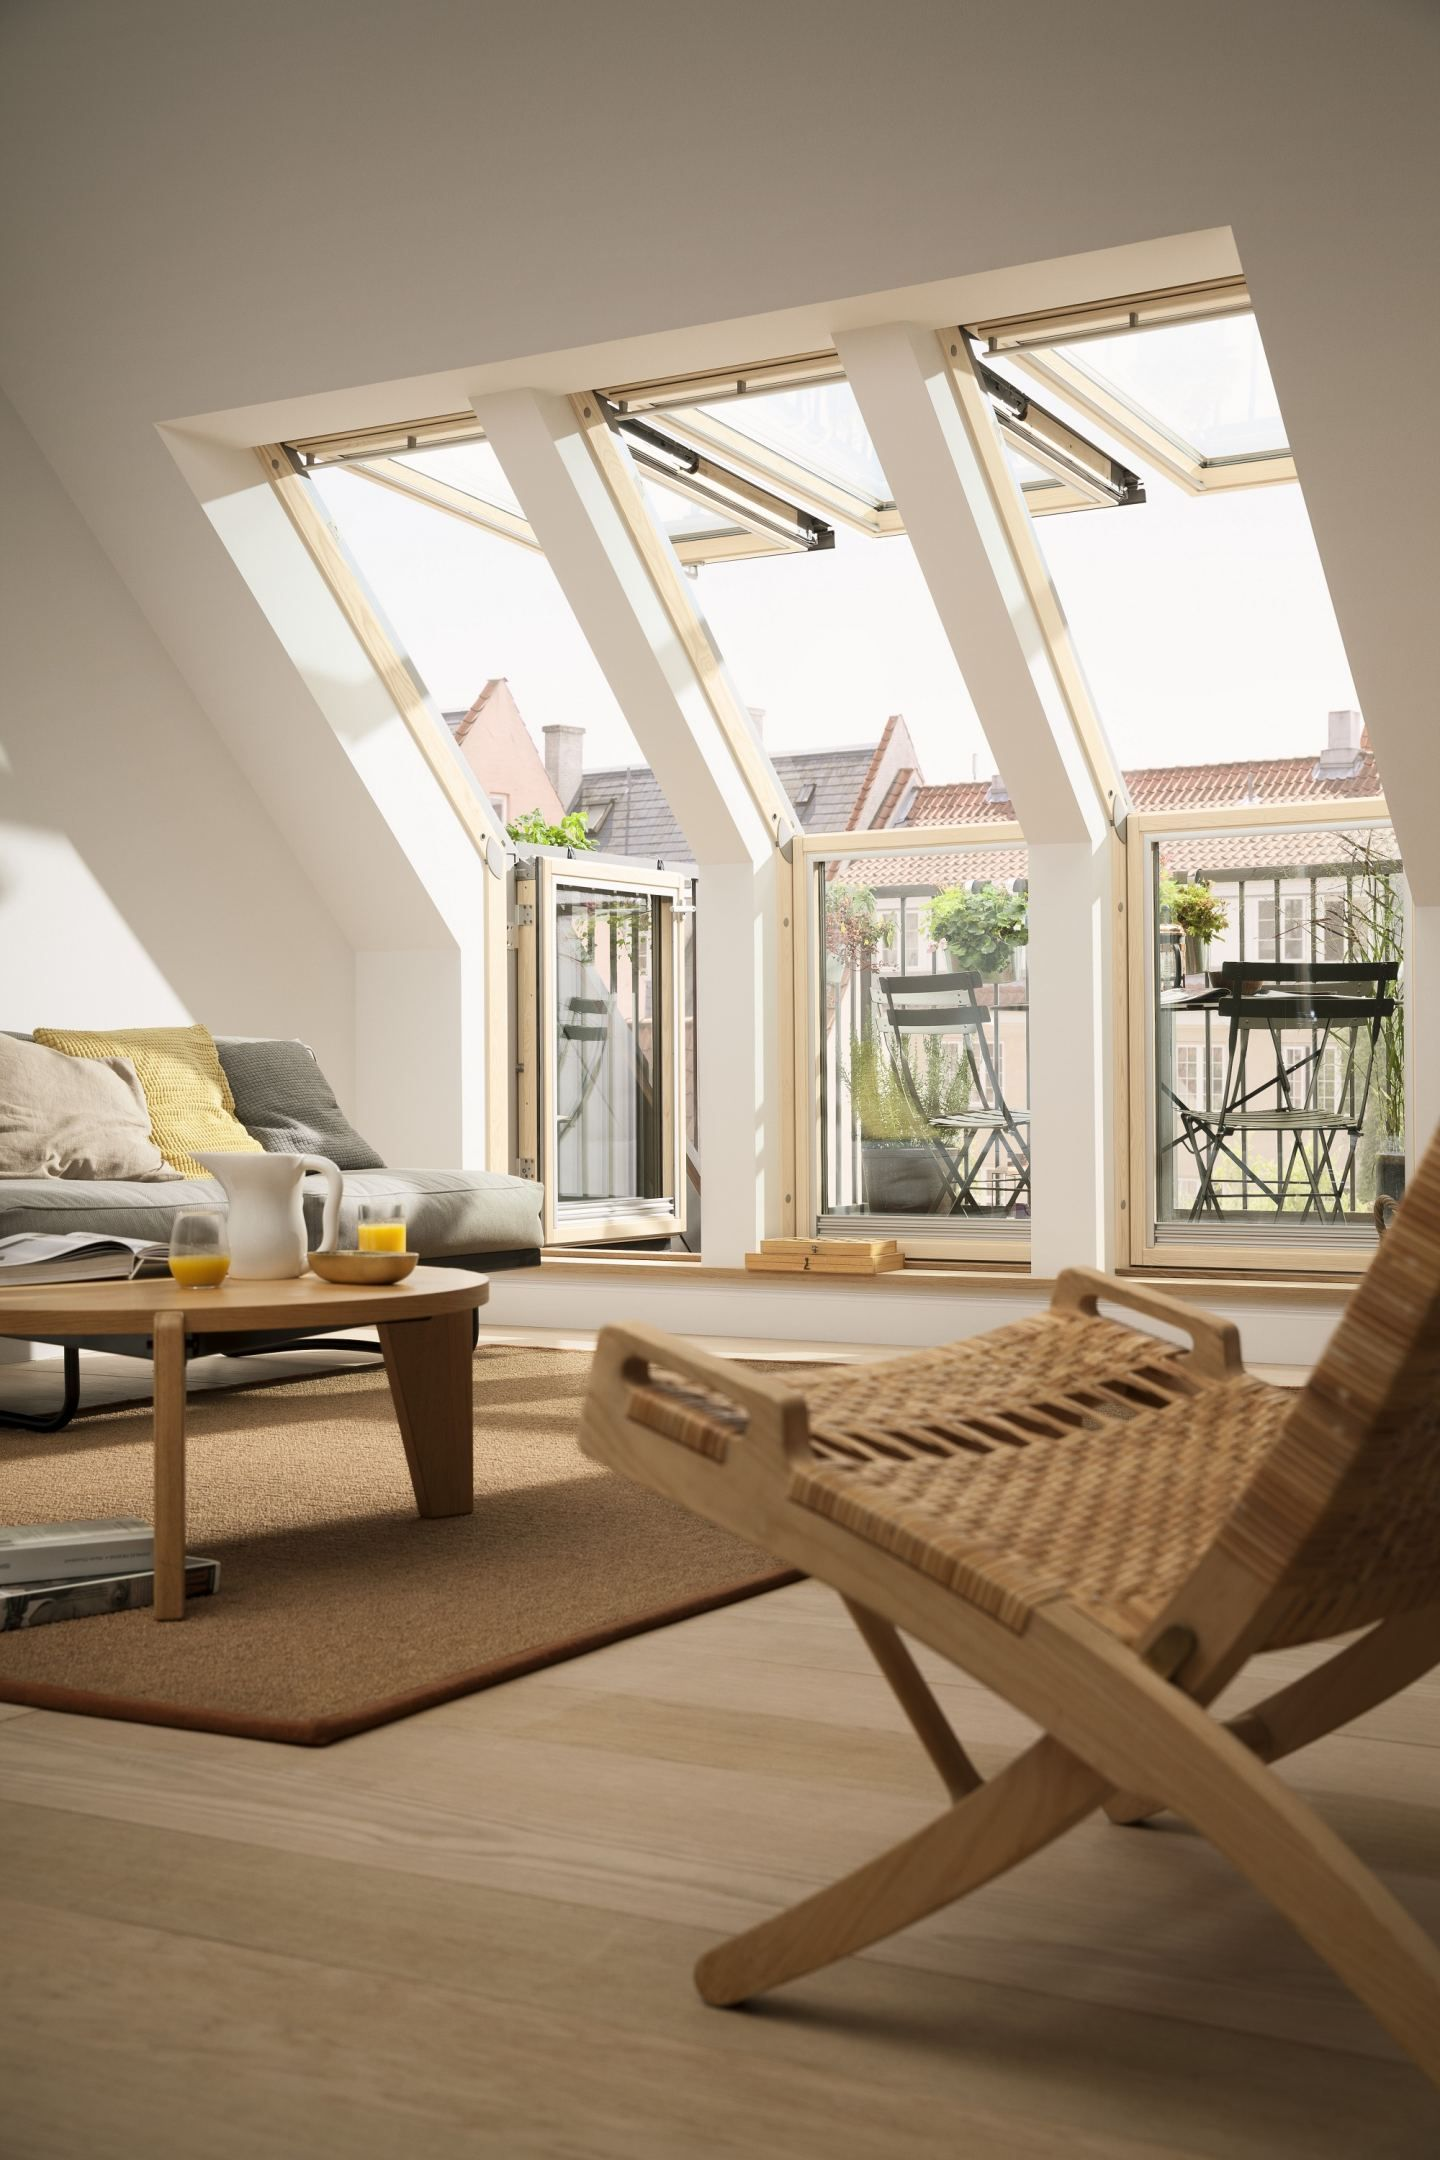 Dreamy Loft Conversion Inspiration #loftconversions